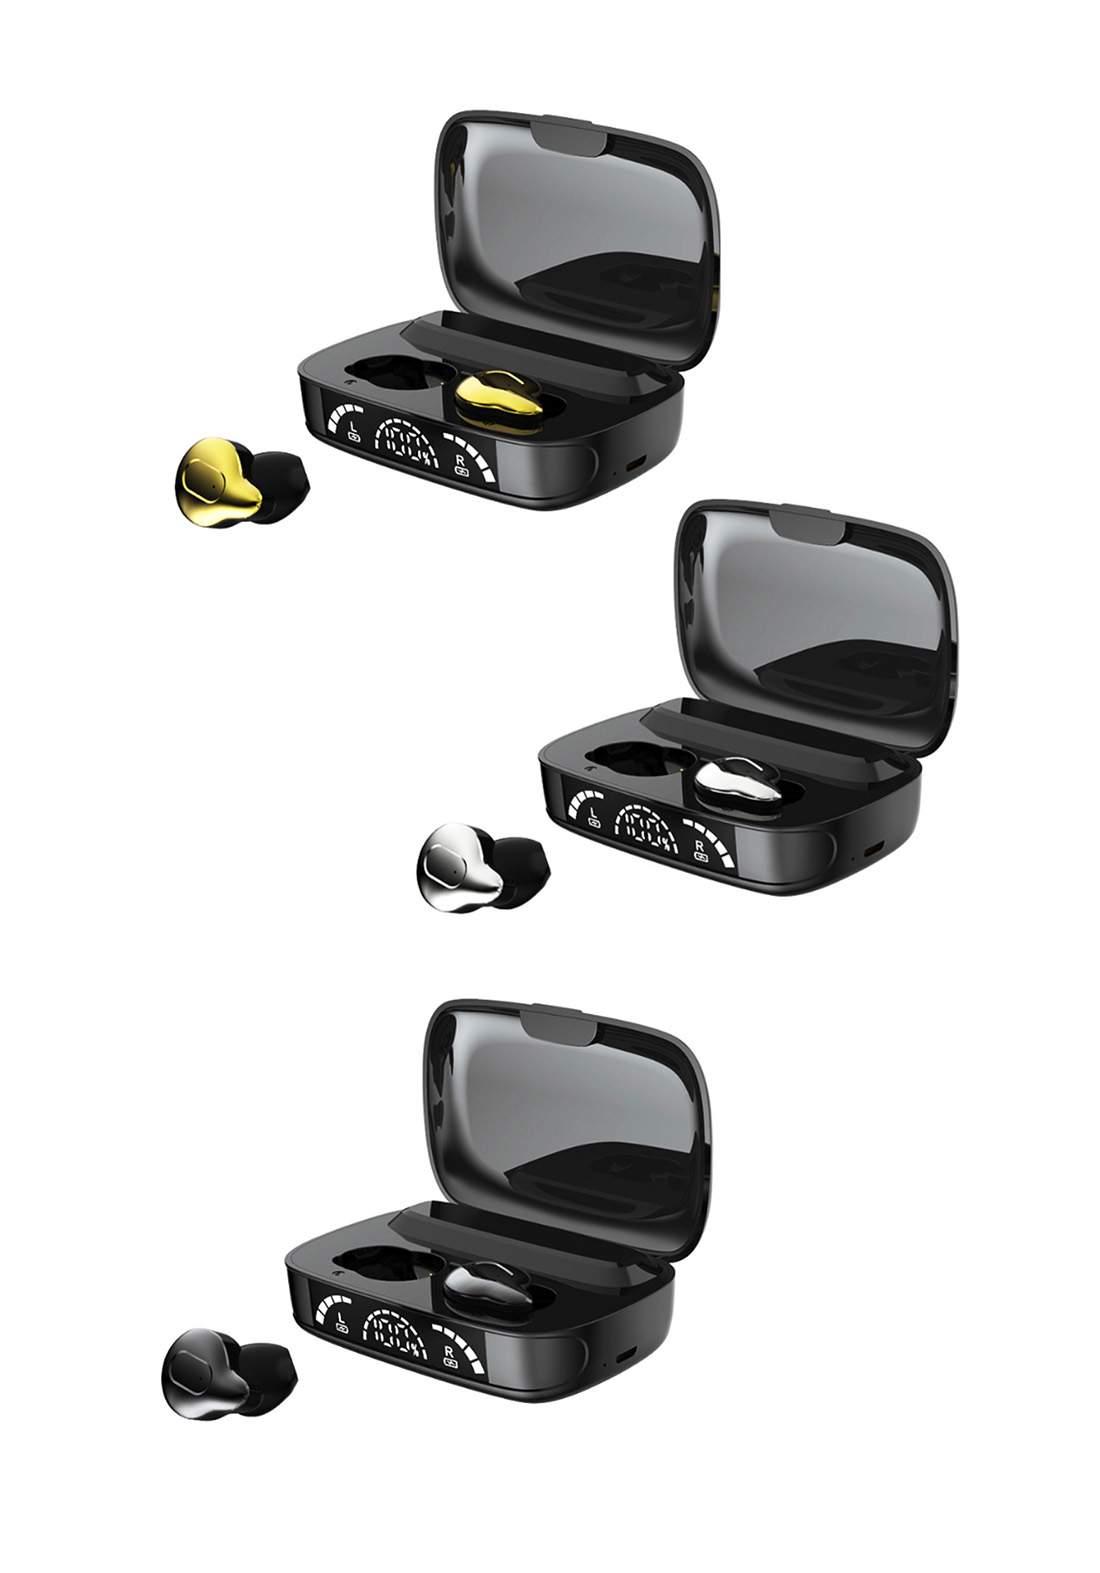 TWS C10 Sport Wireless Stereo Earbuds 5.1  سماعة لاسلكية